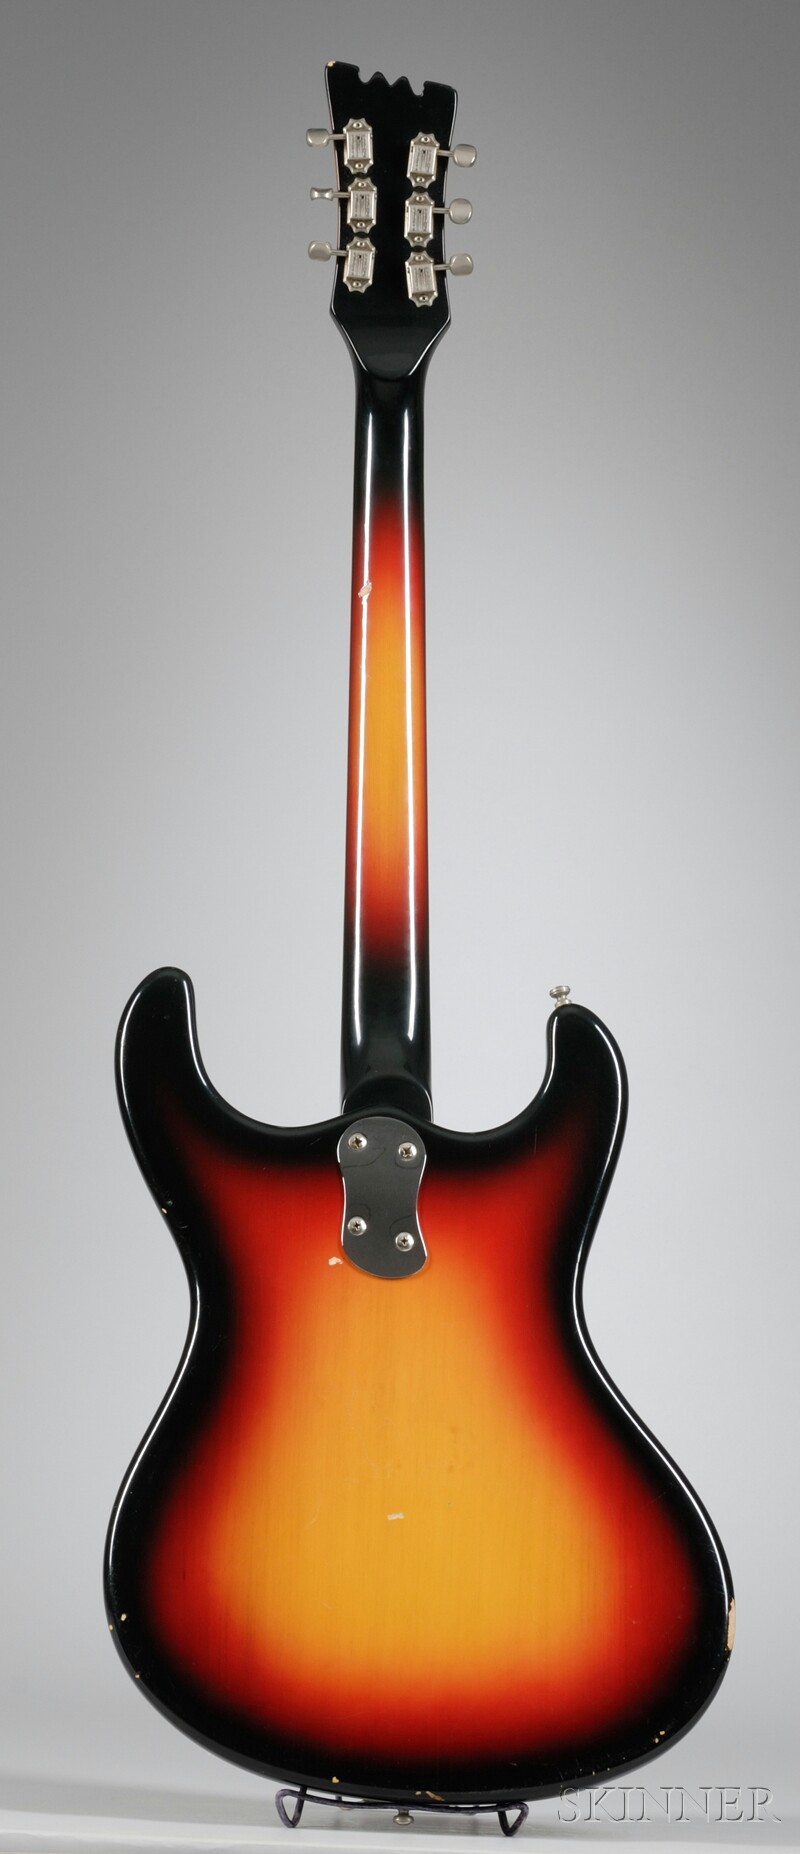 American Electric Guitar, Mosrite of California,